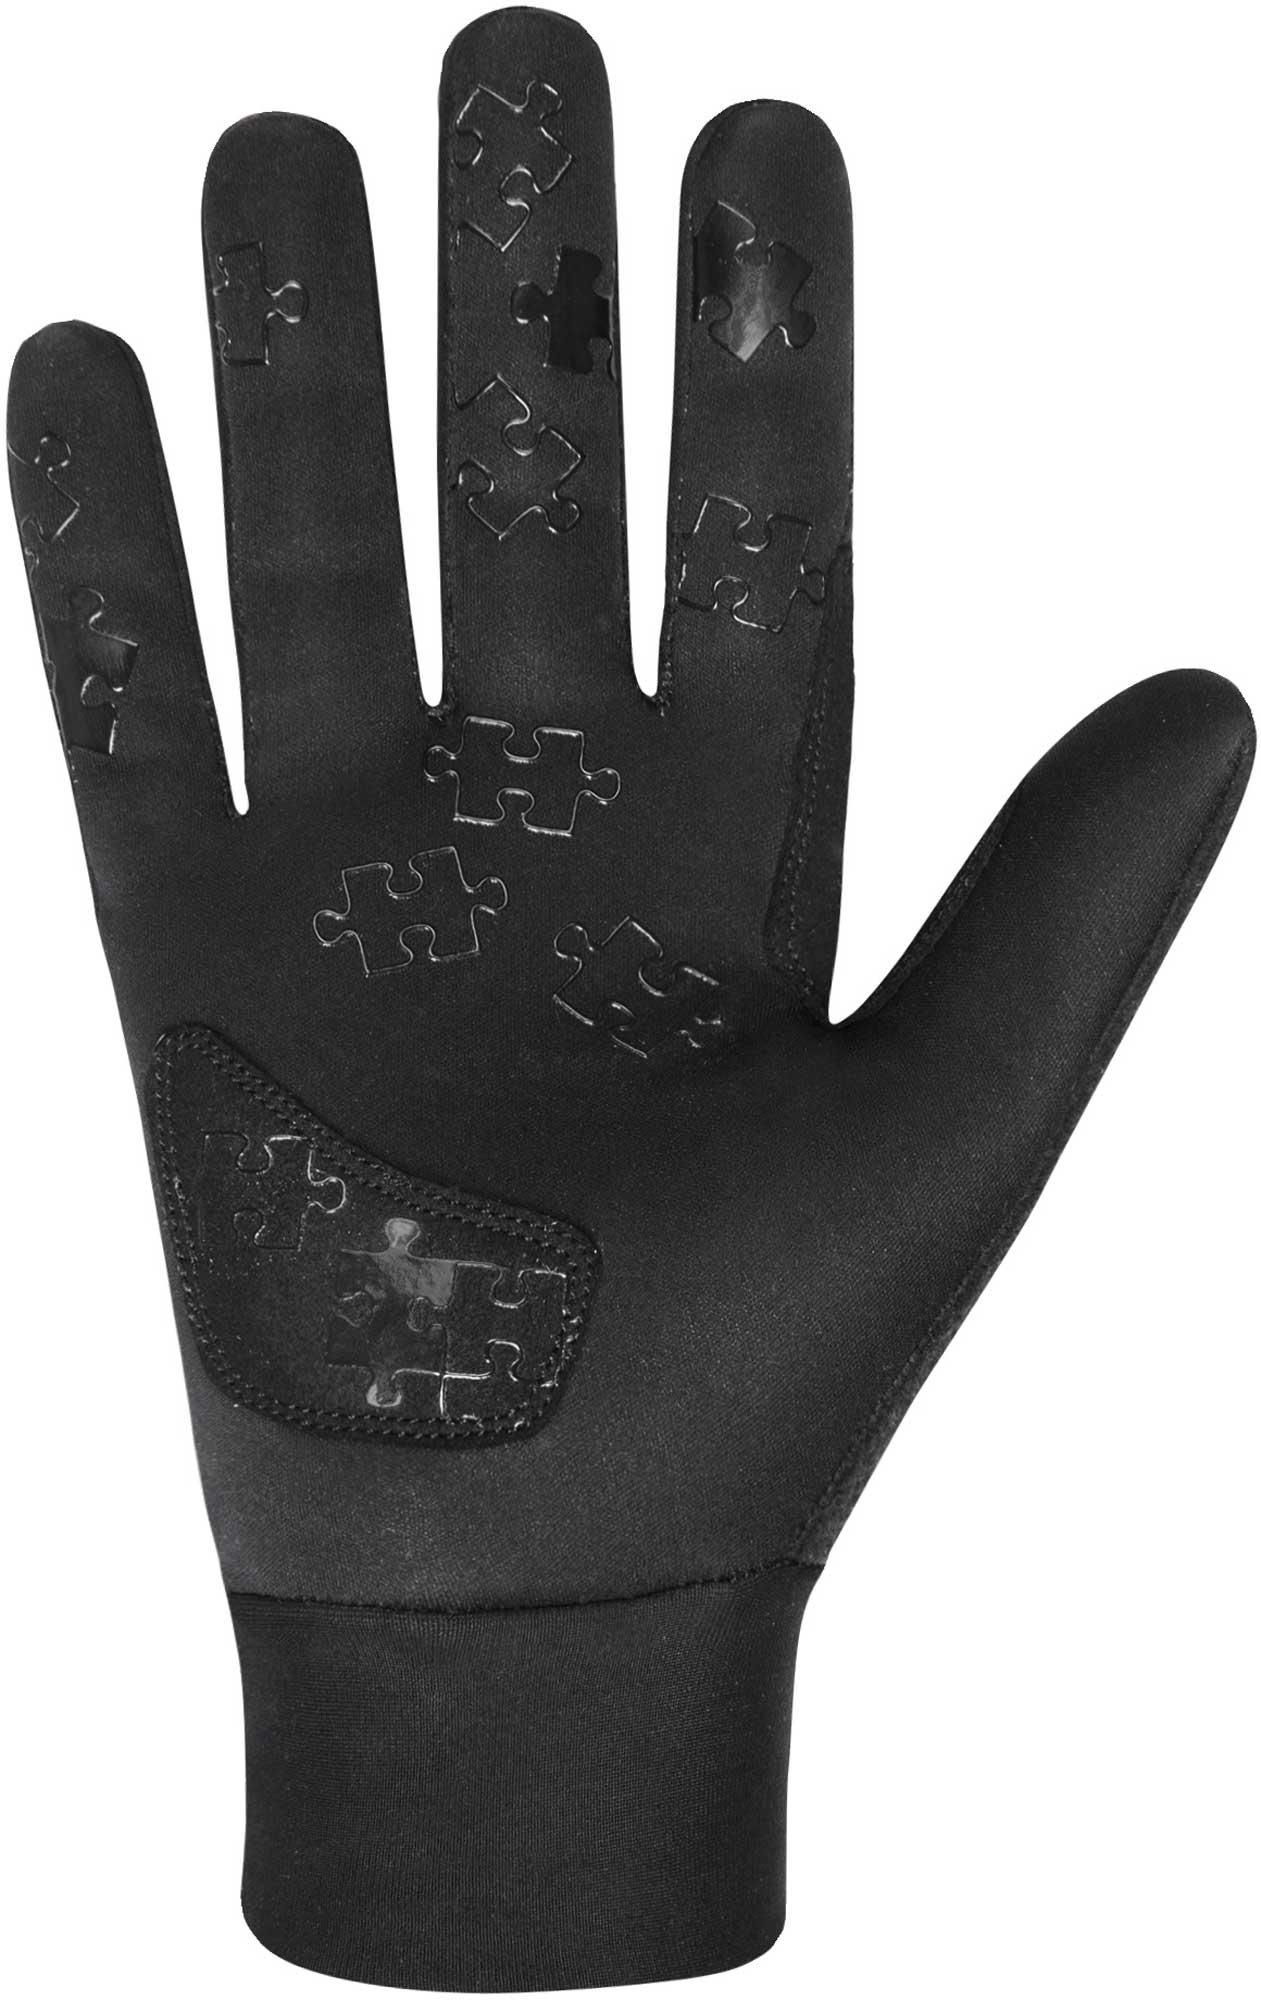 c35fd0e8466 Etape PUZZLE WS. Detské rukavice. Detské rukavice